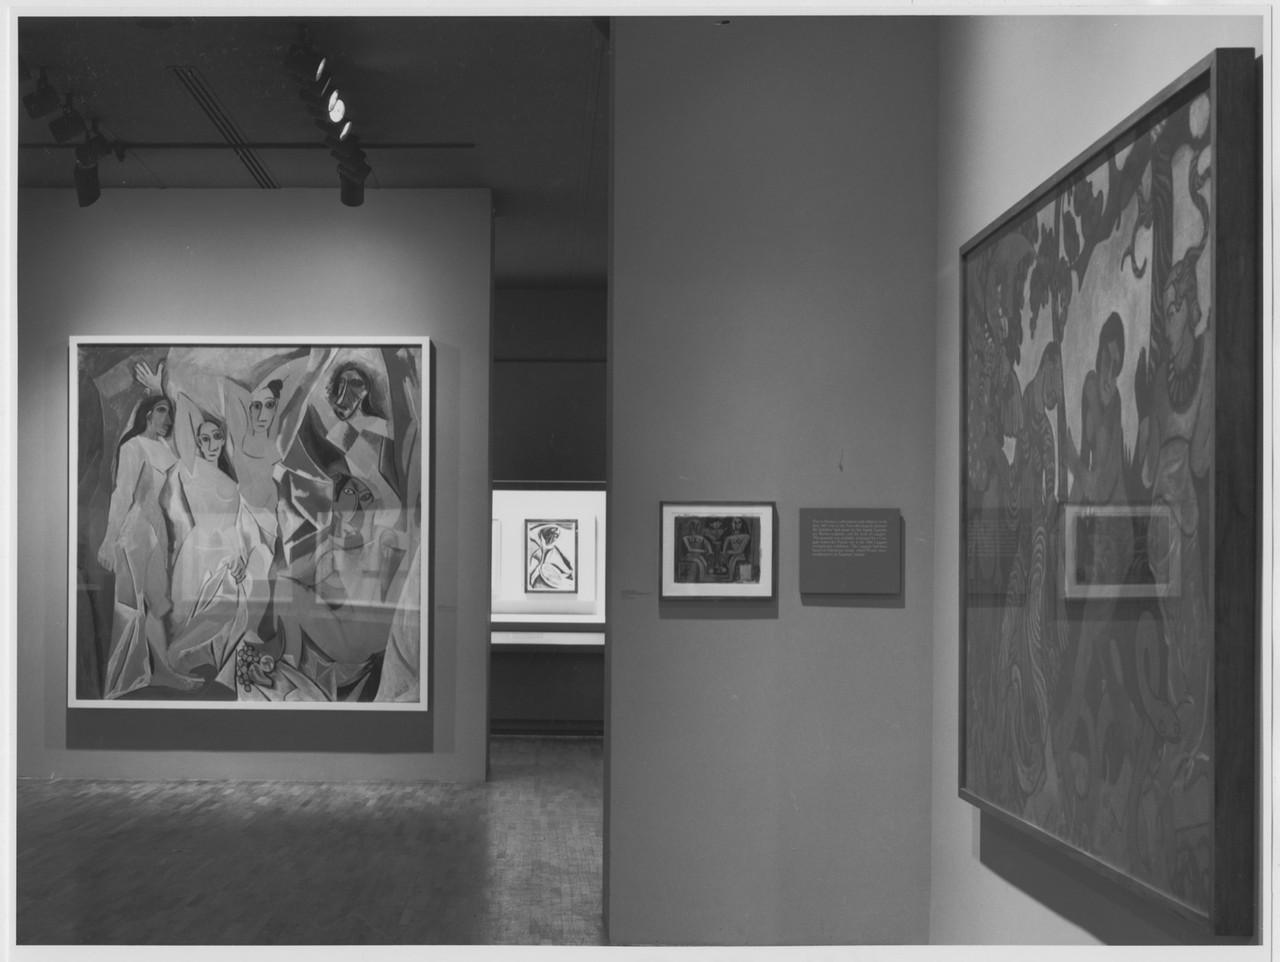 Primitivism at MoMA #2